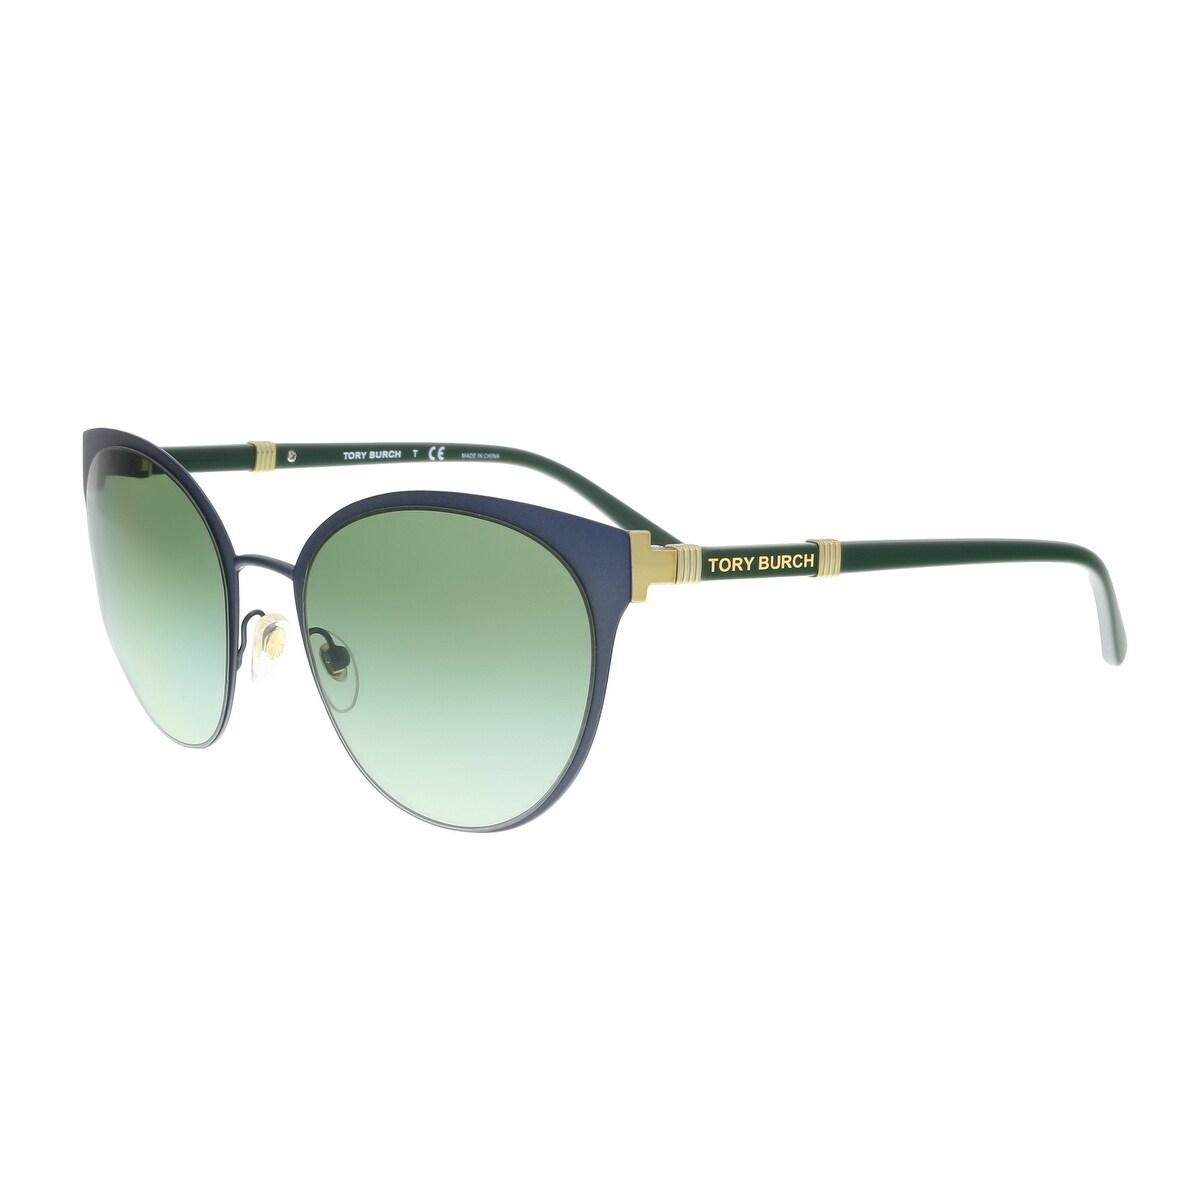 852aec0ab0aaa Tory Burch Sunglasses